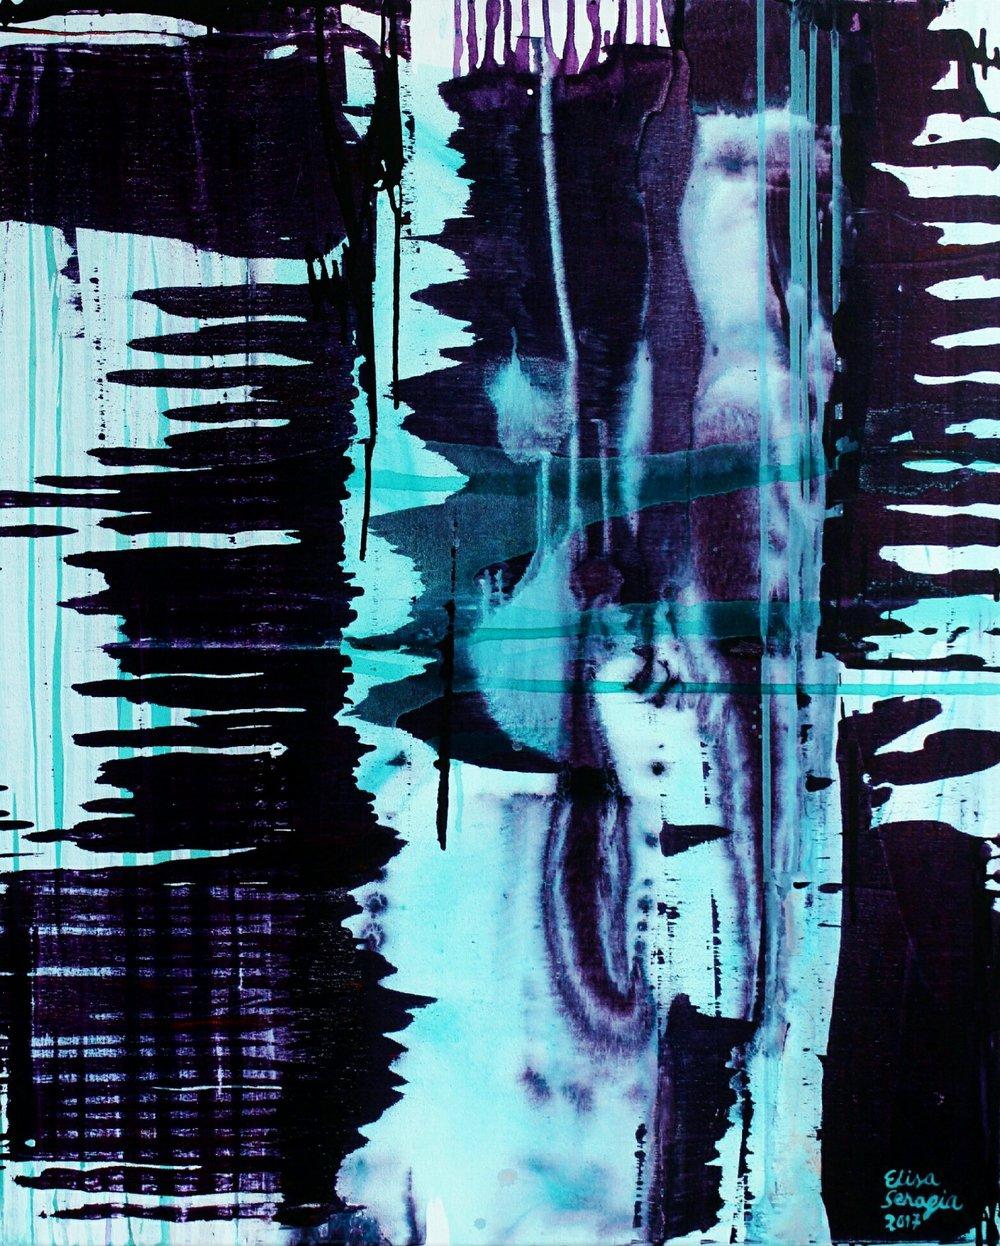 Helmikuu, Akryyli kankaalle, 81 cm x 100 cm  Myyty / Sold